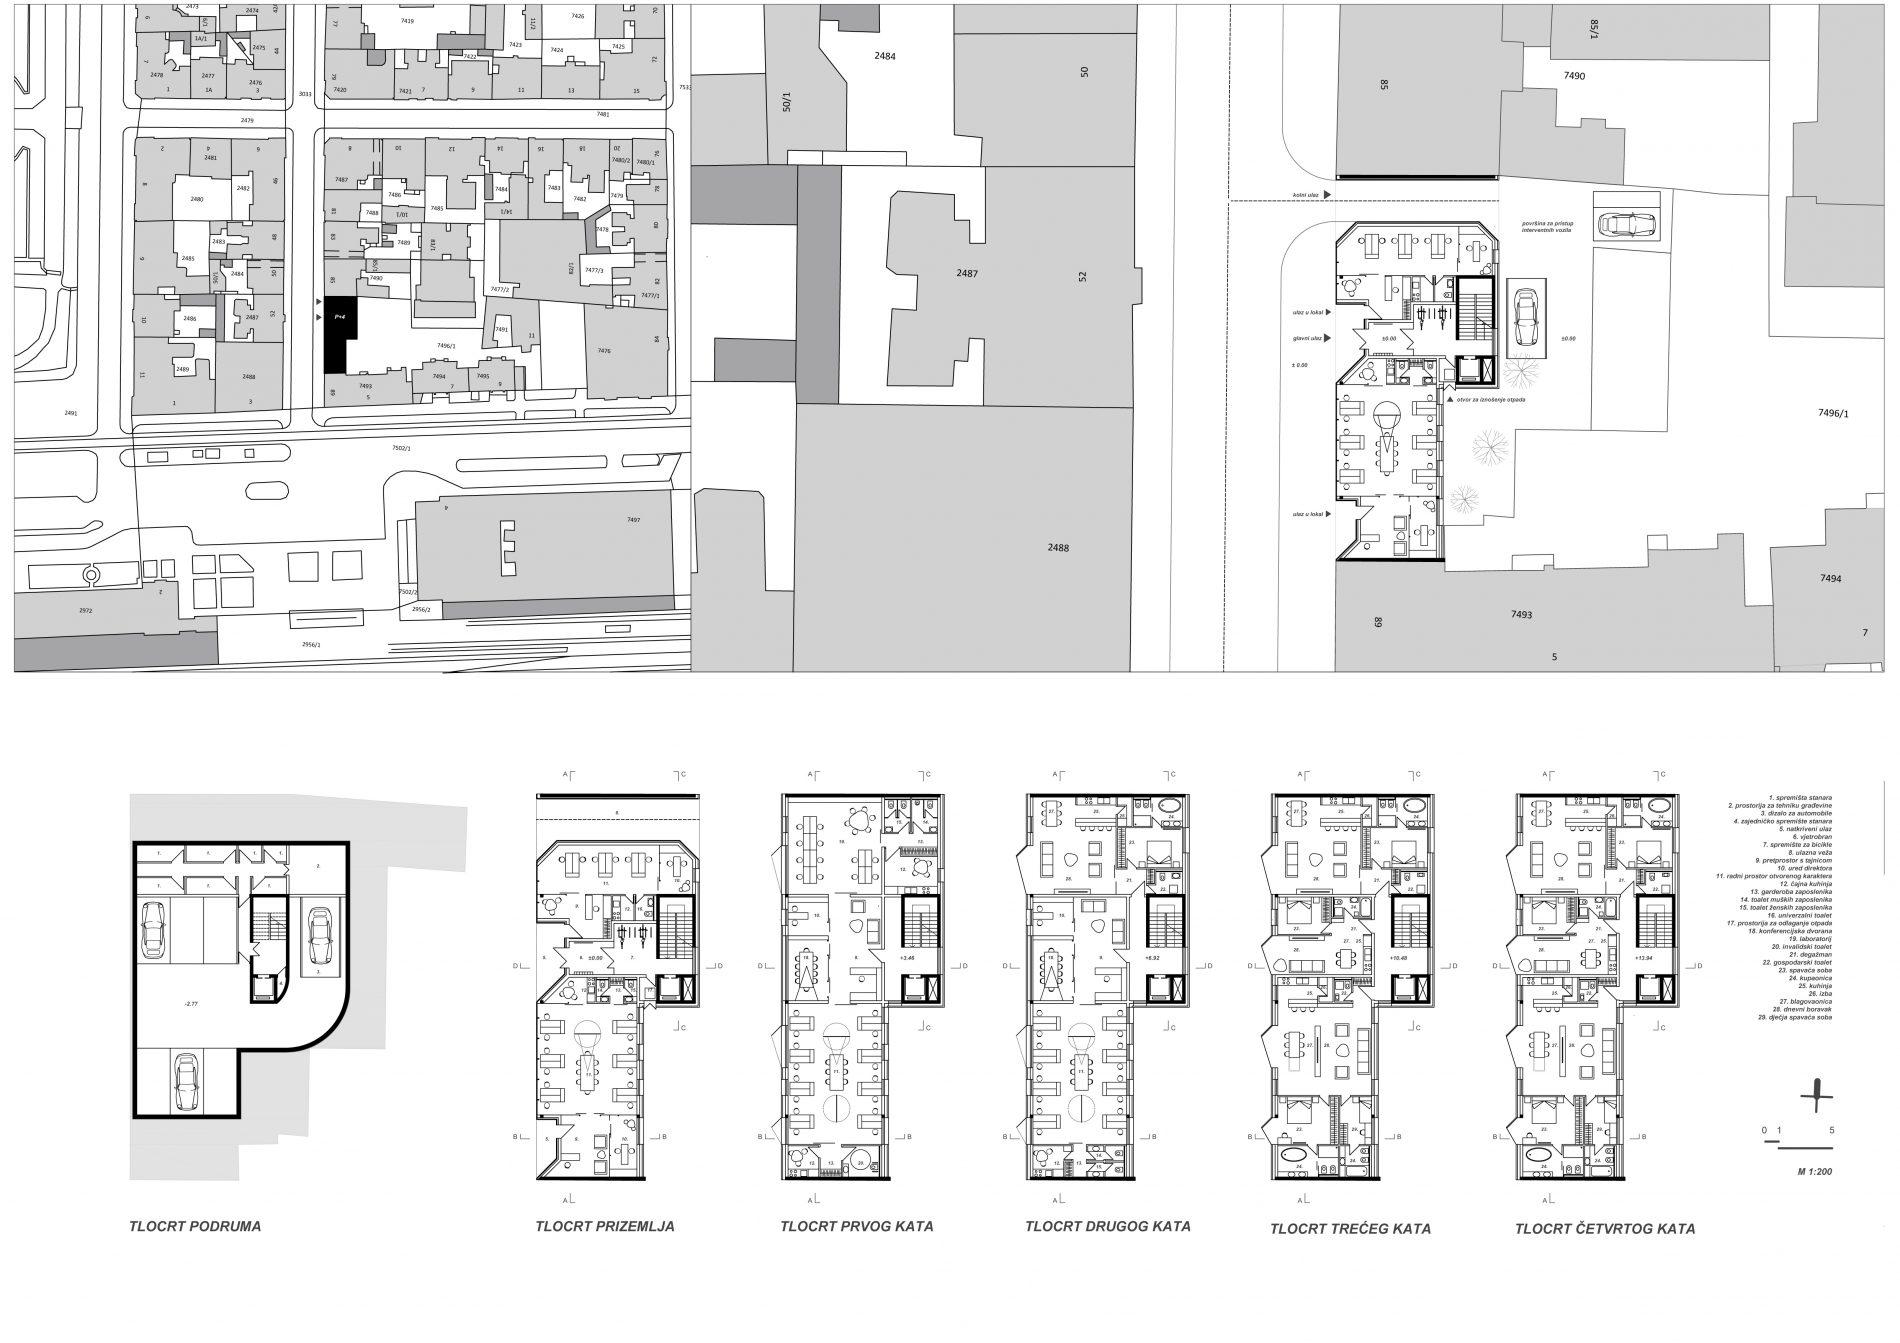 petrinjska 87, stanovanje, family, interior, architecture, internship, stručna praksa arhitekti, upi-2m, natječaj, competition